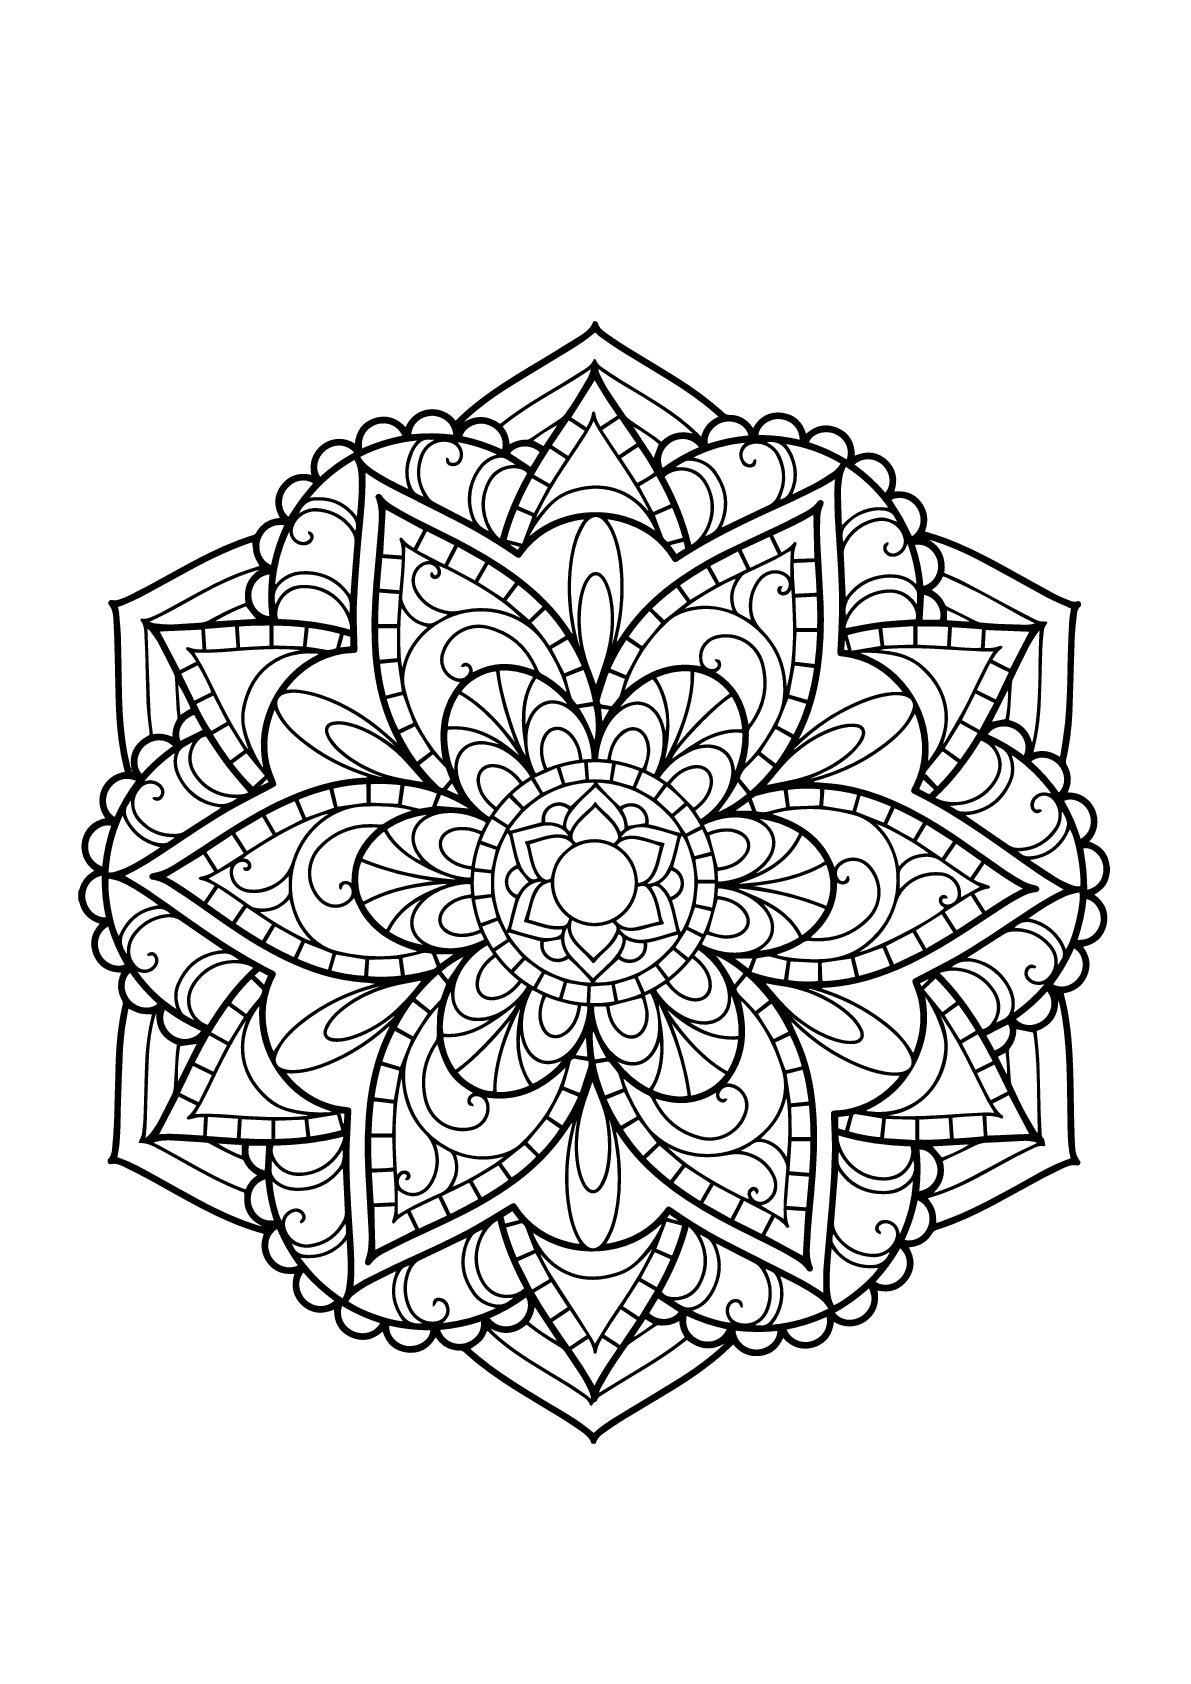 Colorear para adultos  : Mandalas - 15